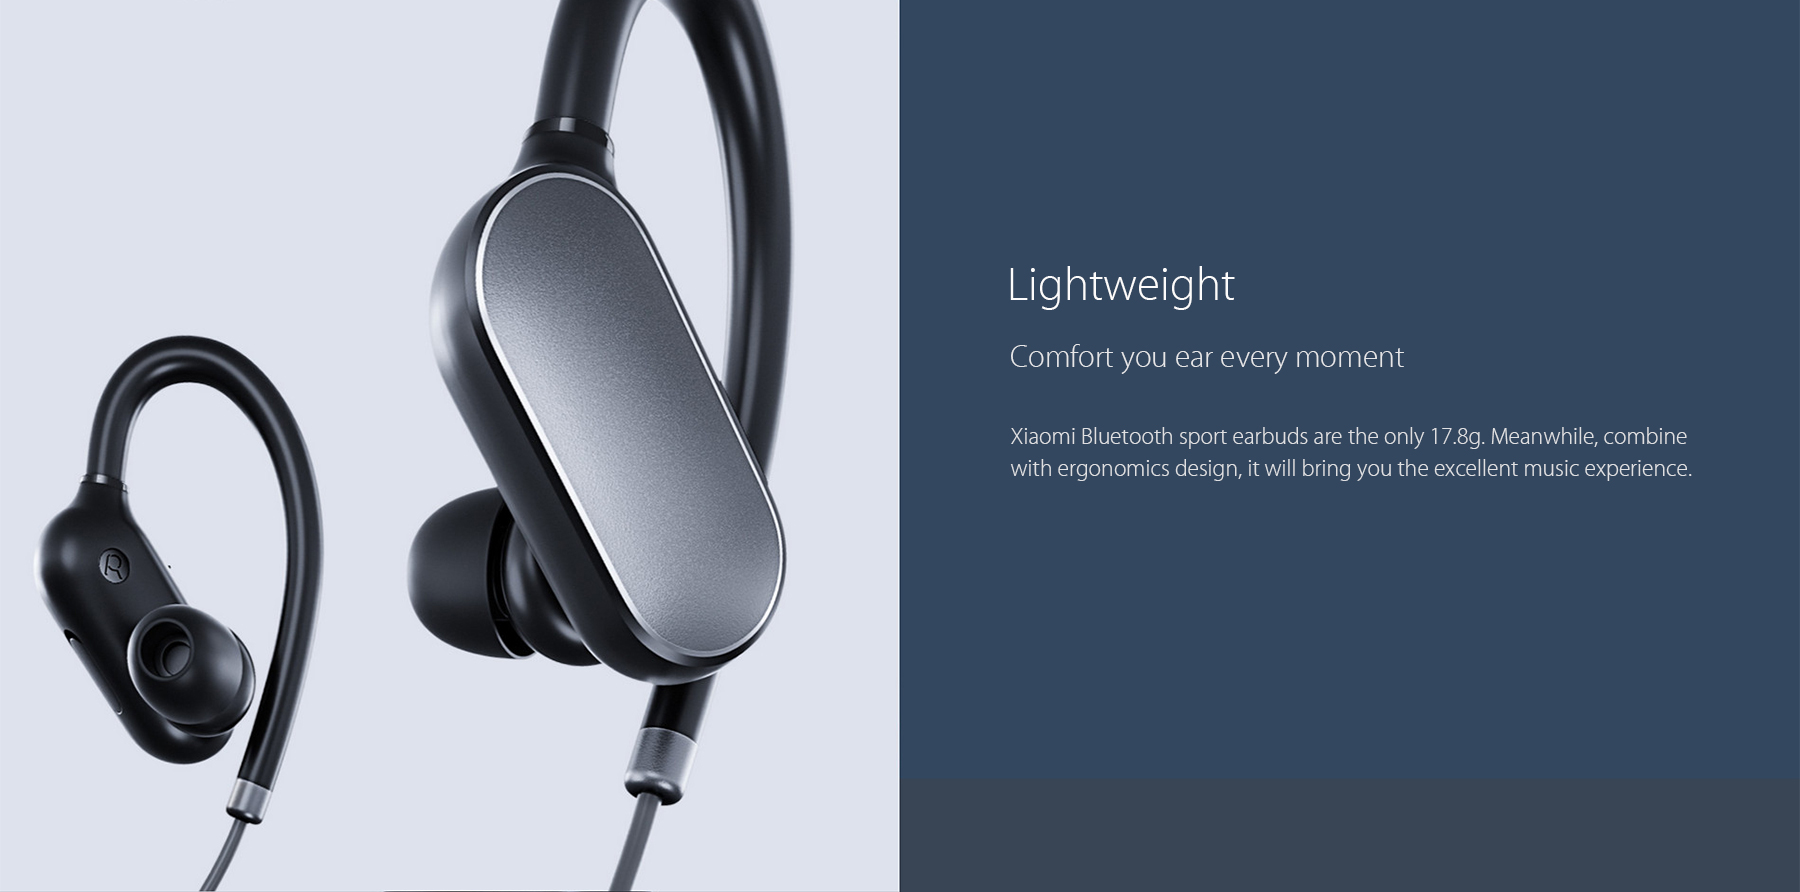 33687f93c3c Xiaomi YDLYEJ01LM Bluetooth 4.1 Music Sport Earbuds Hands Free Calls Volume  Control Song Switch Waterproof Wireless Earphone-in Bluetooth Earphones ...